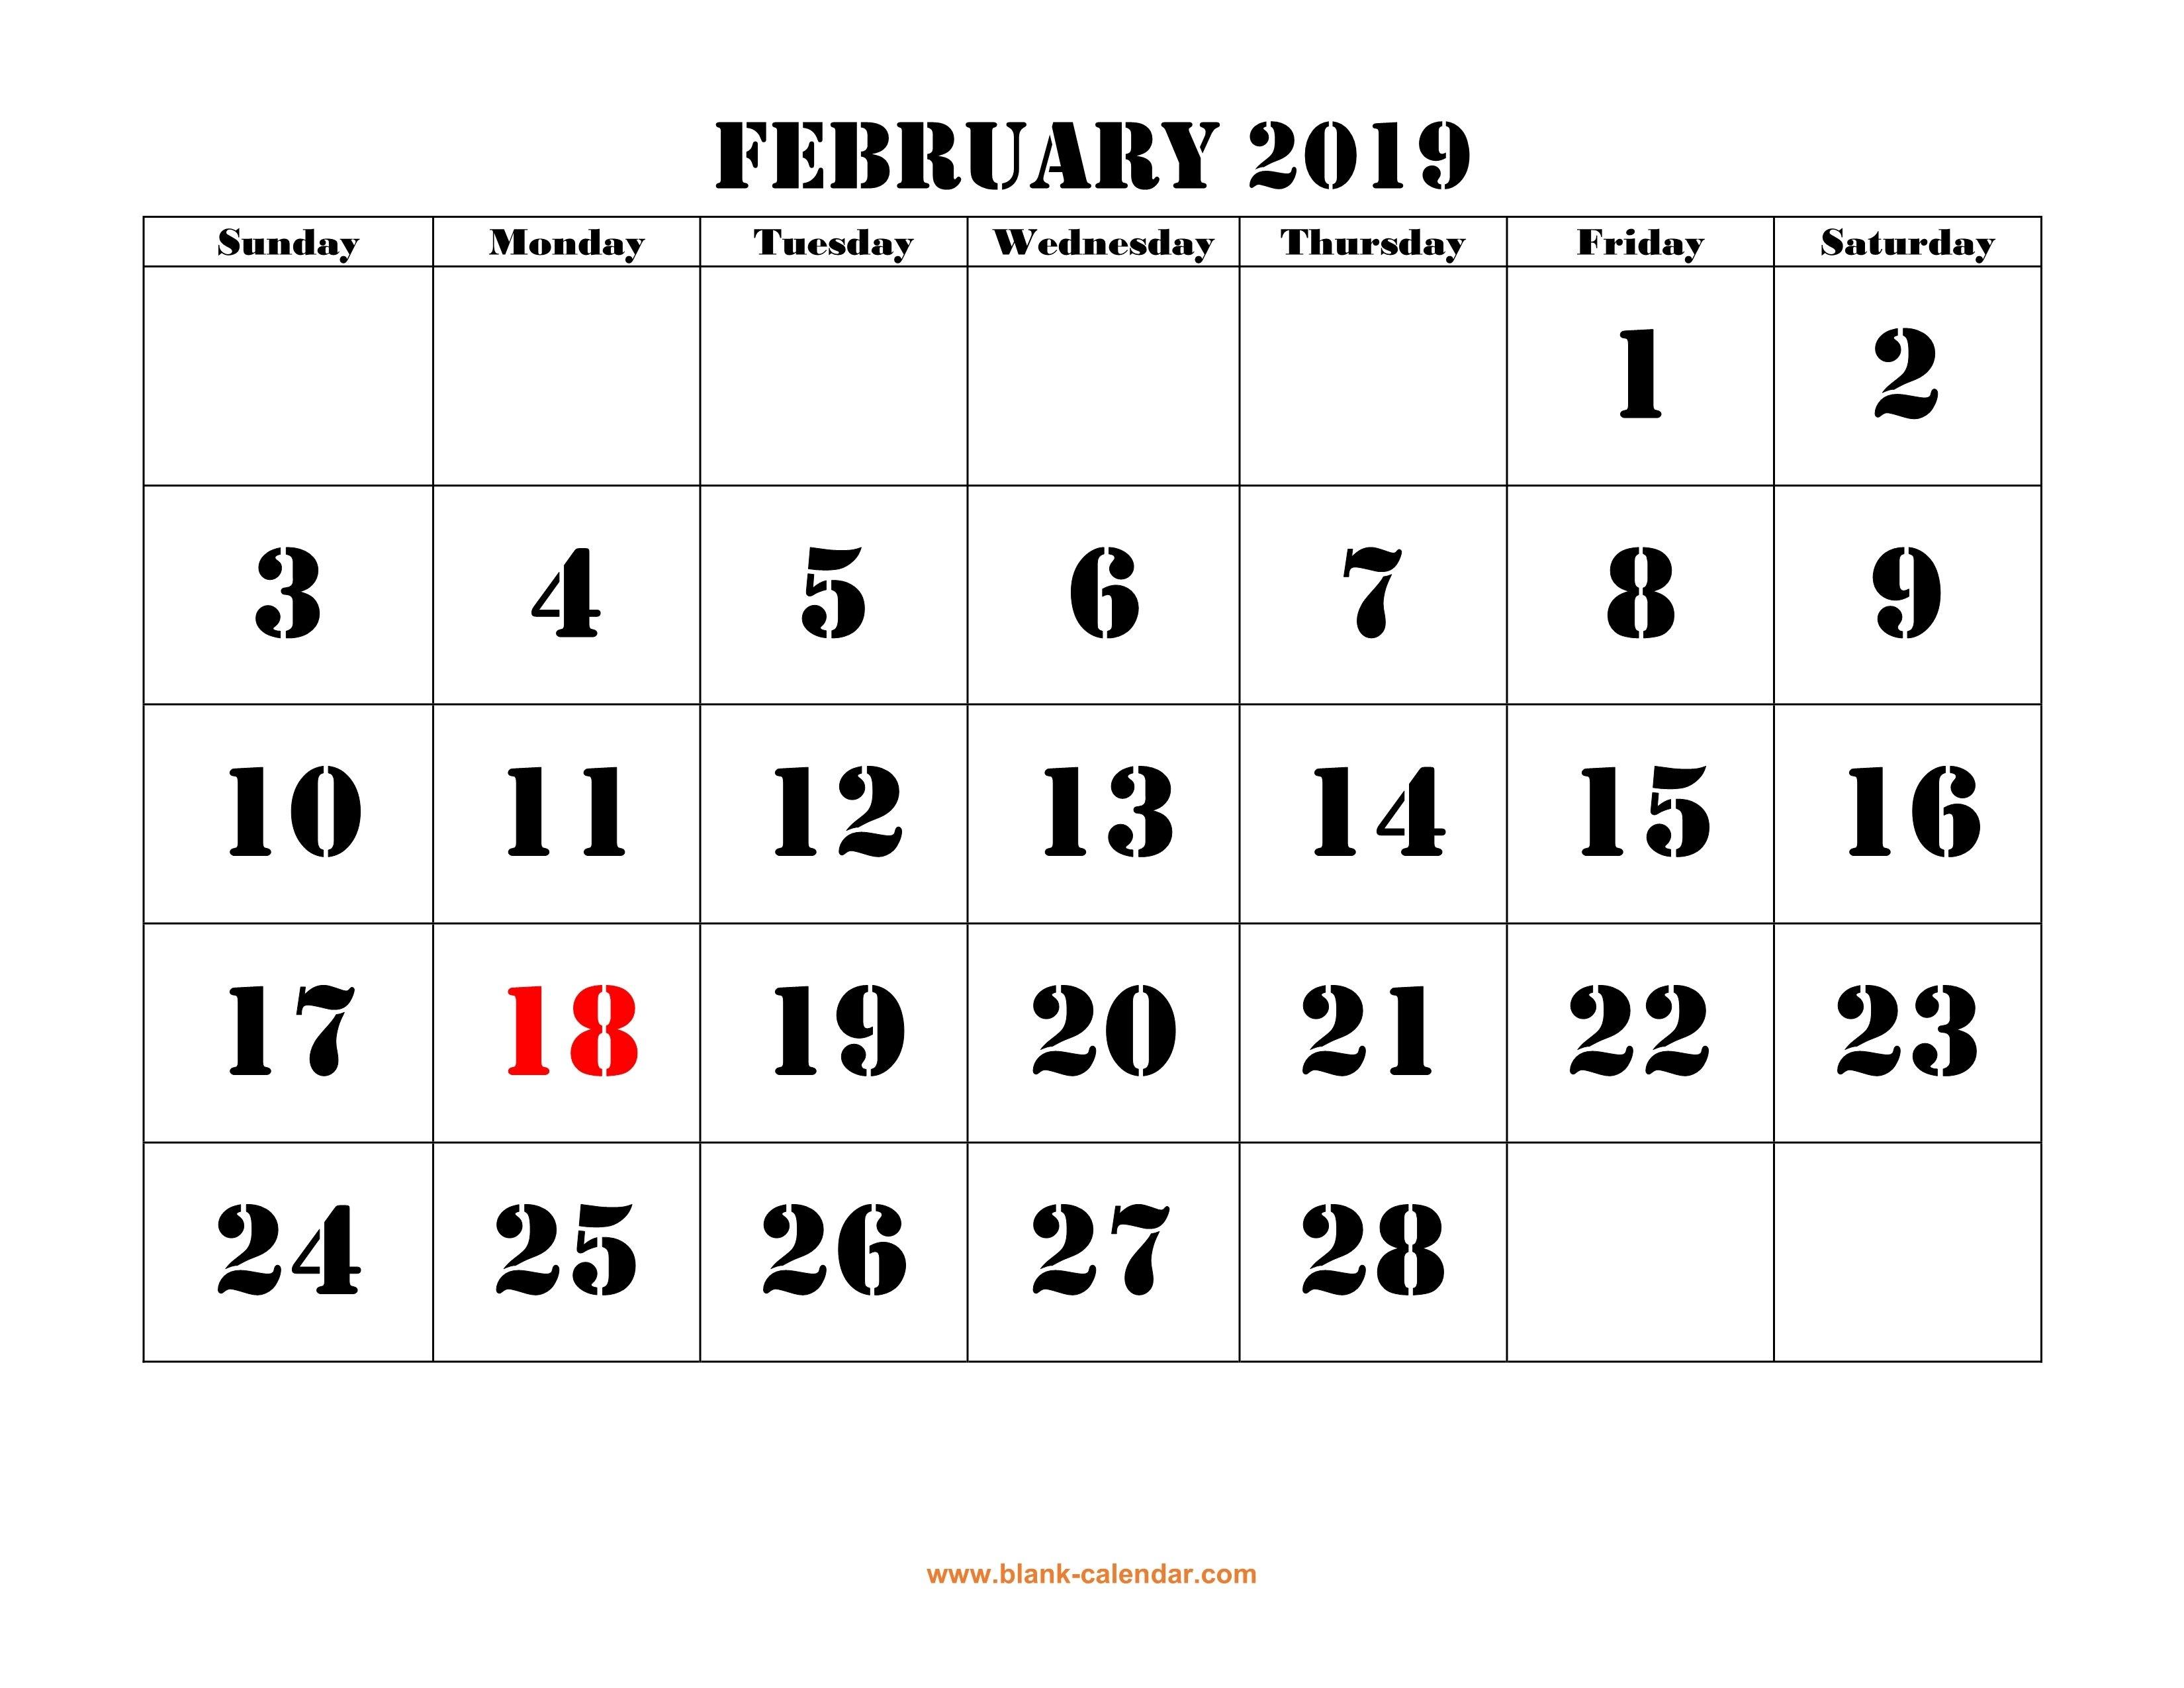 Free Download Printable February 2019 Calendar, Large Font Design February 4 2019 Calendar